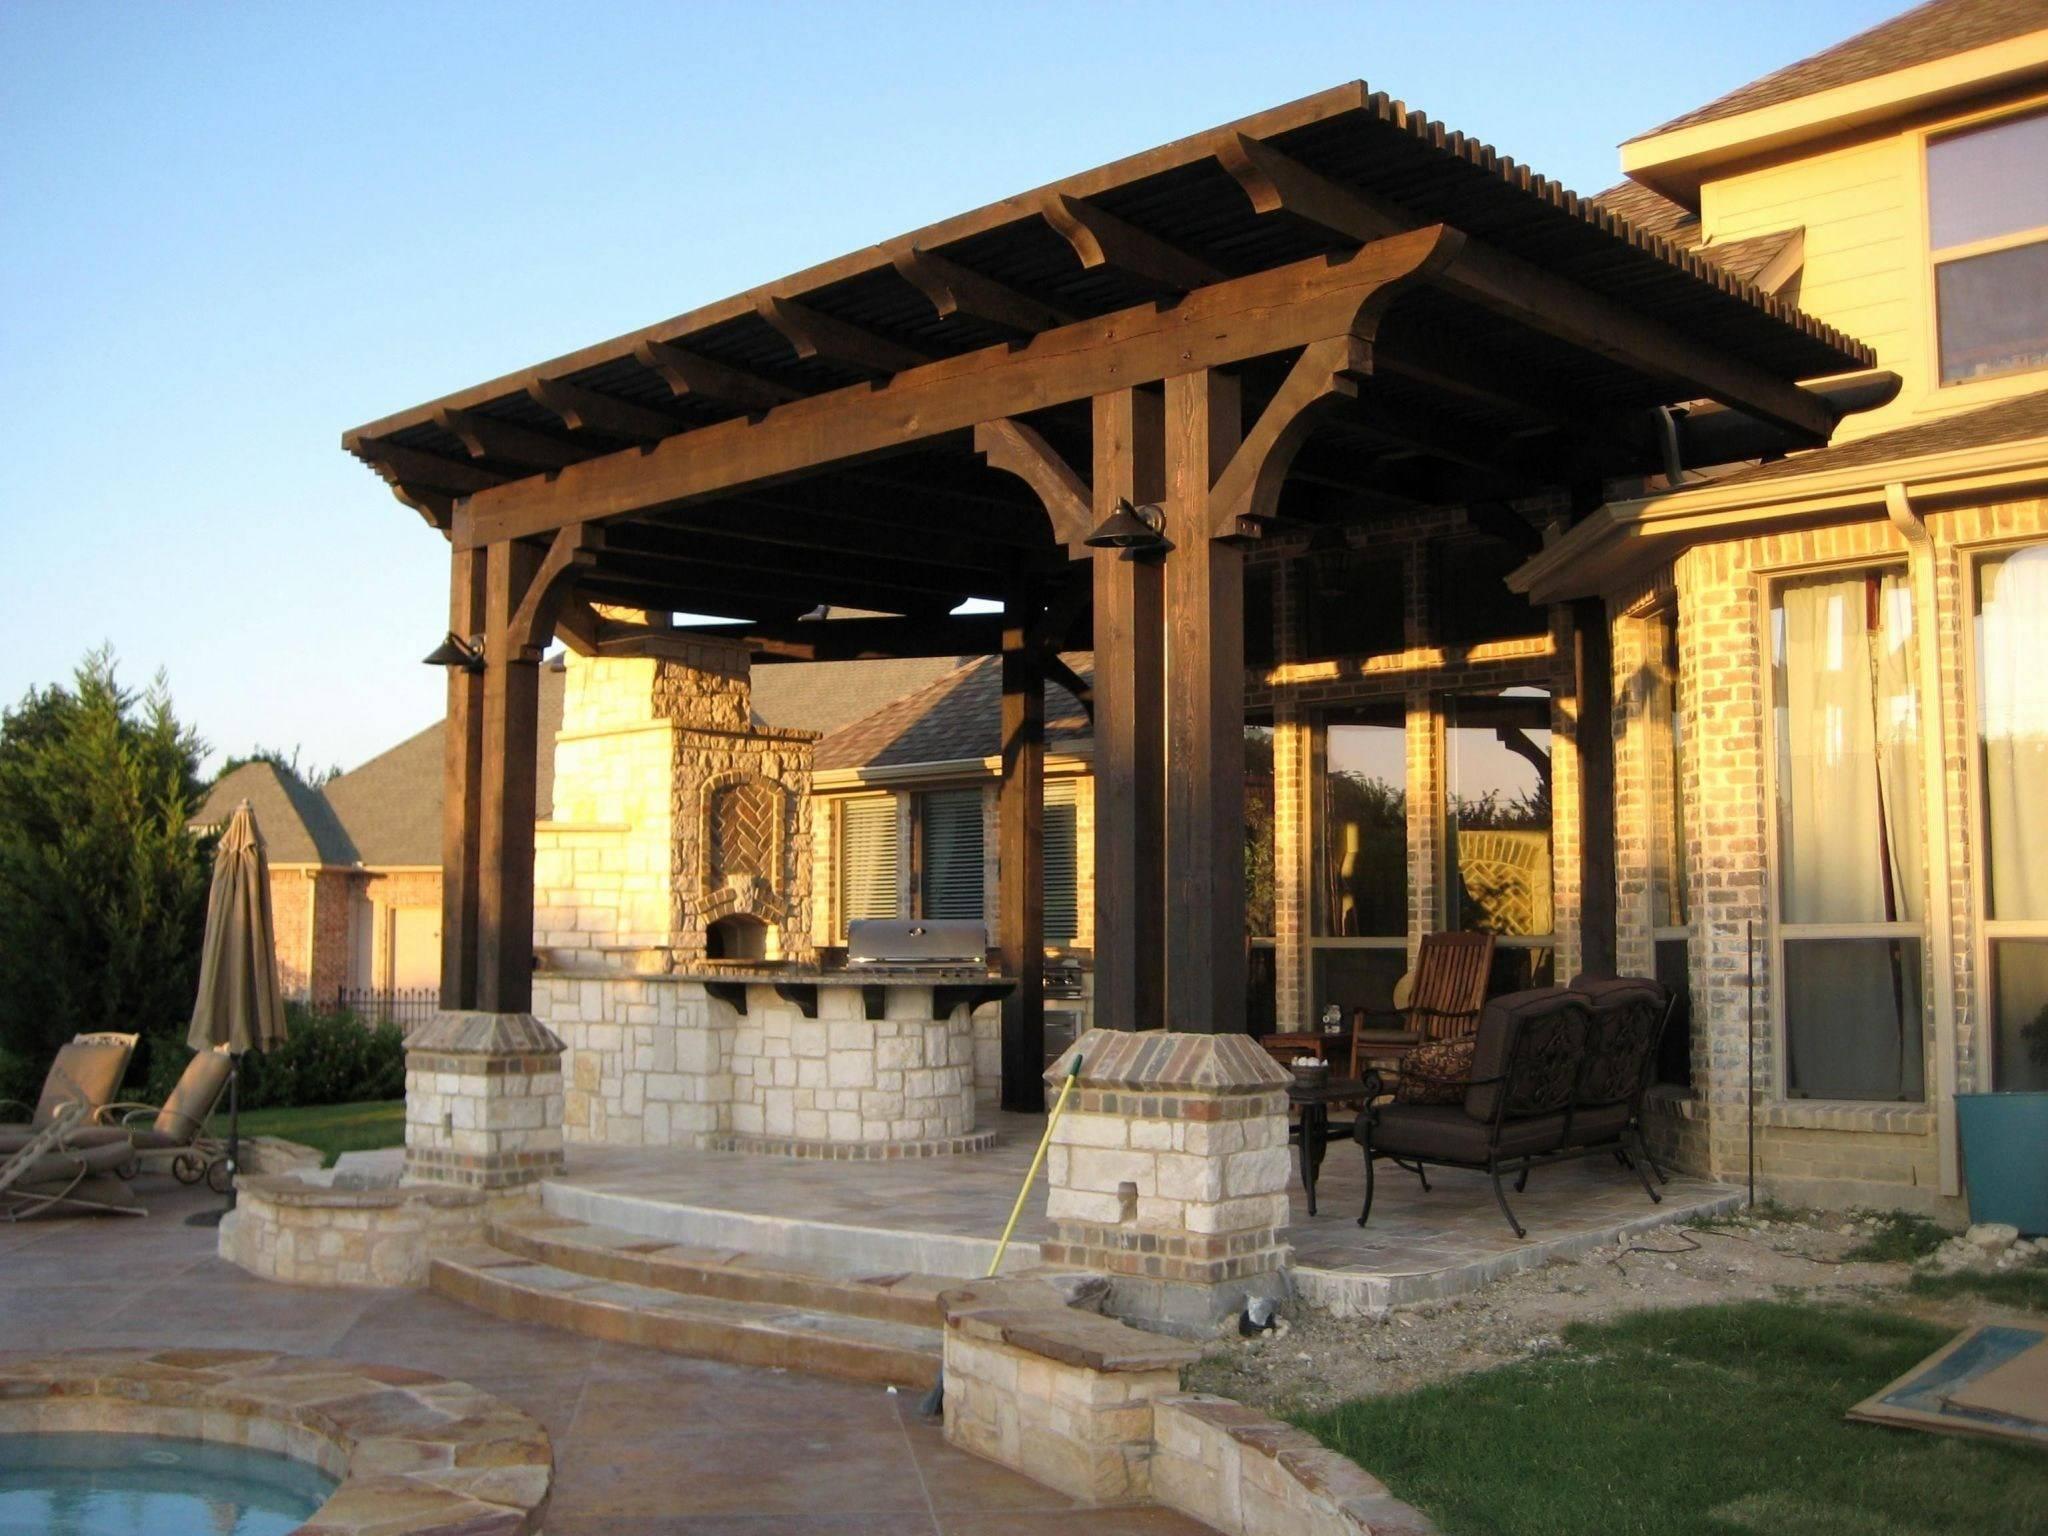 diy deck pergola beautiful porch pergola plans krigs operan home plans of diy deck pergola